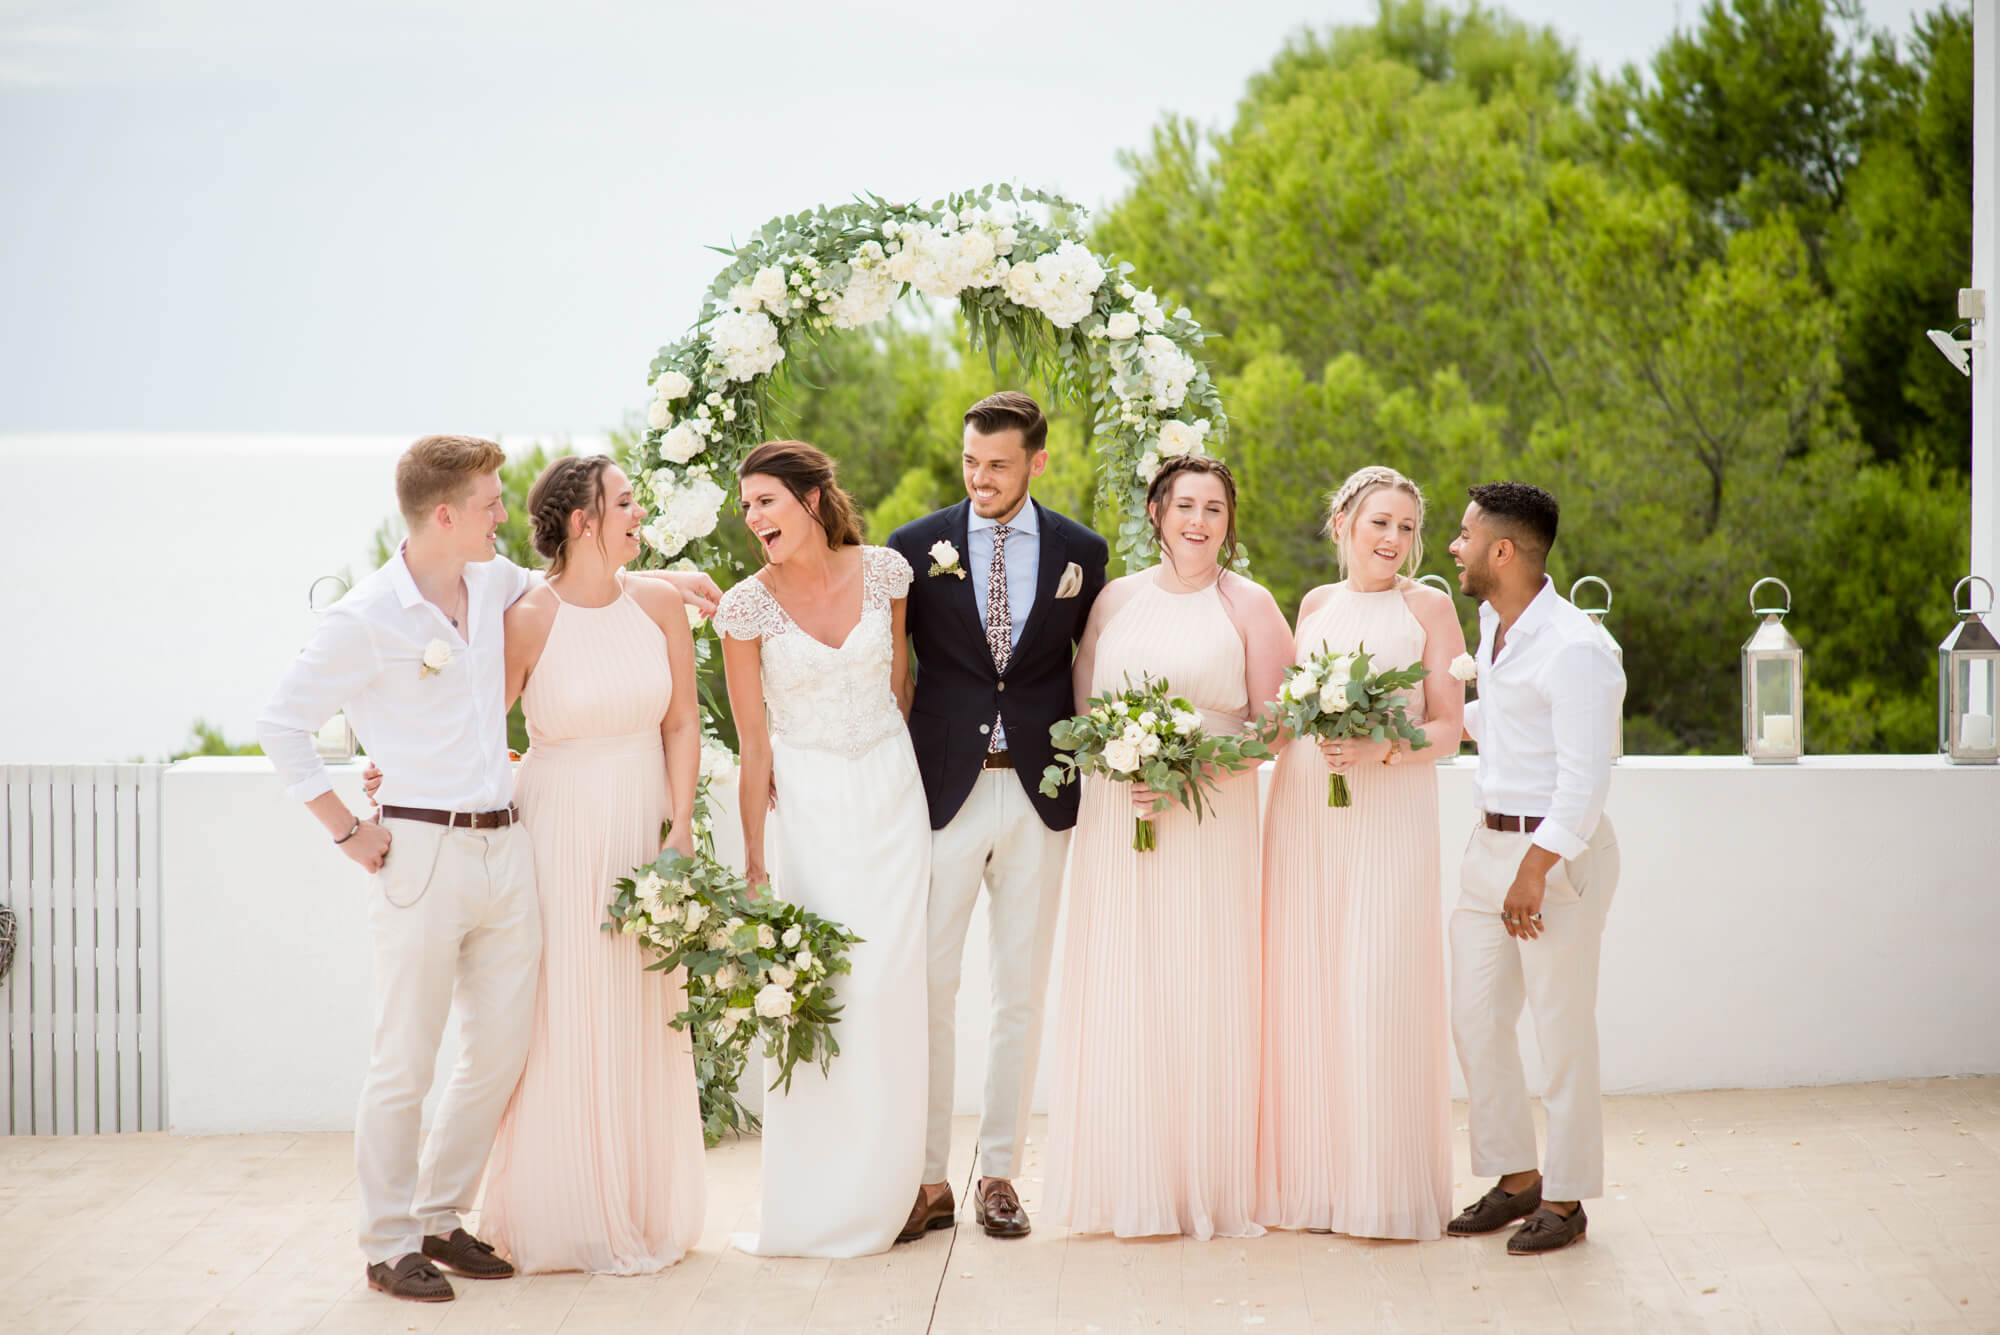 bridal party formal photos bridesmaids best men